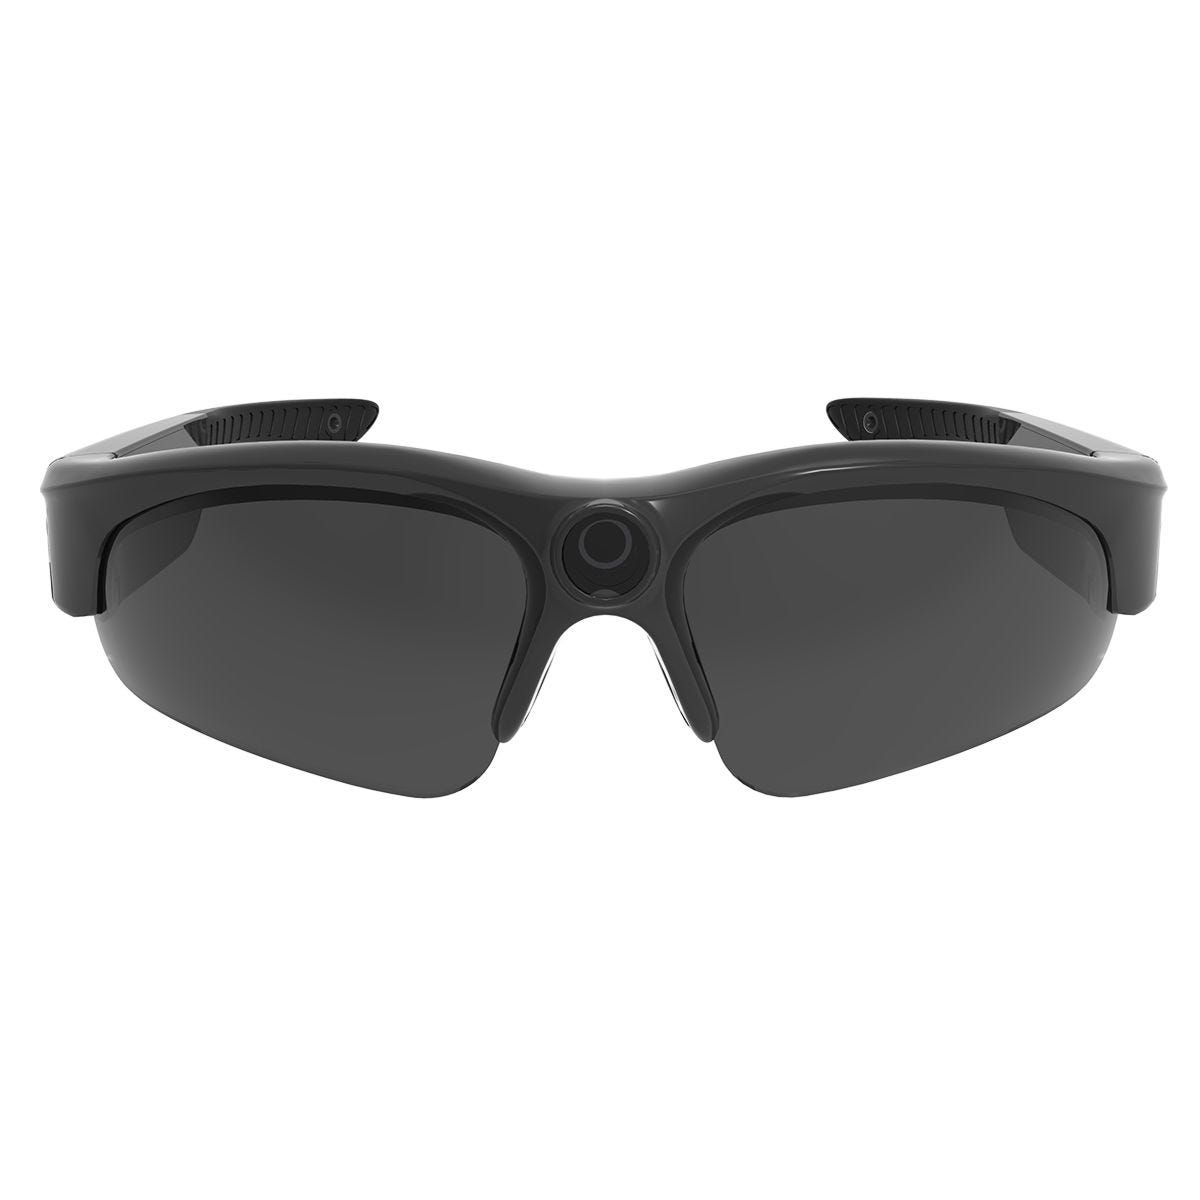 SunnyCam Sport 1080HD Wide Angle DVR Camera Eyewear